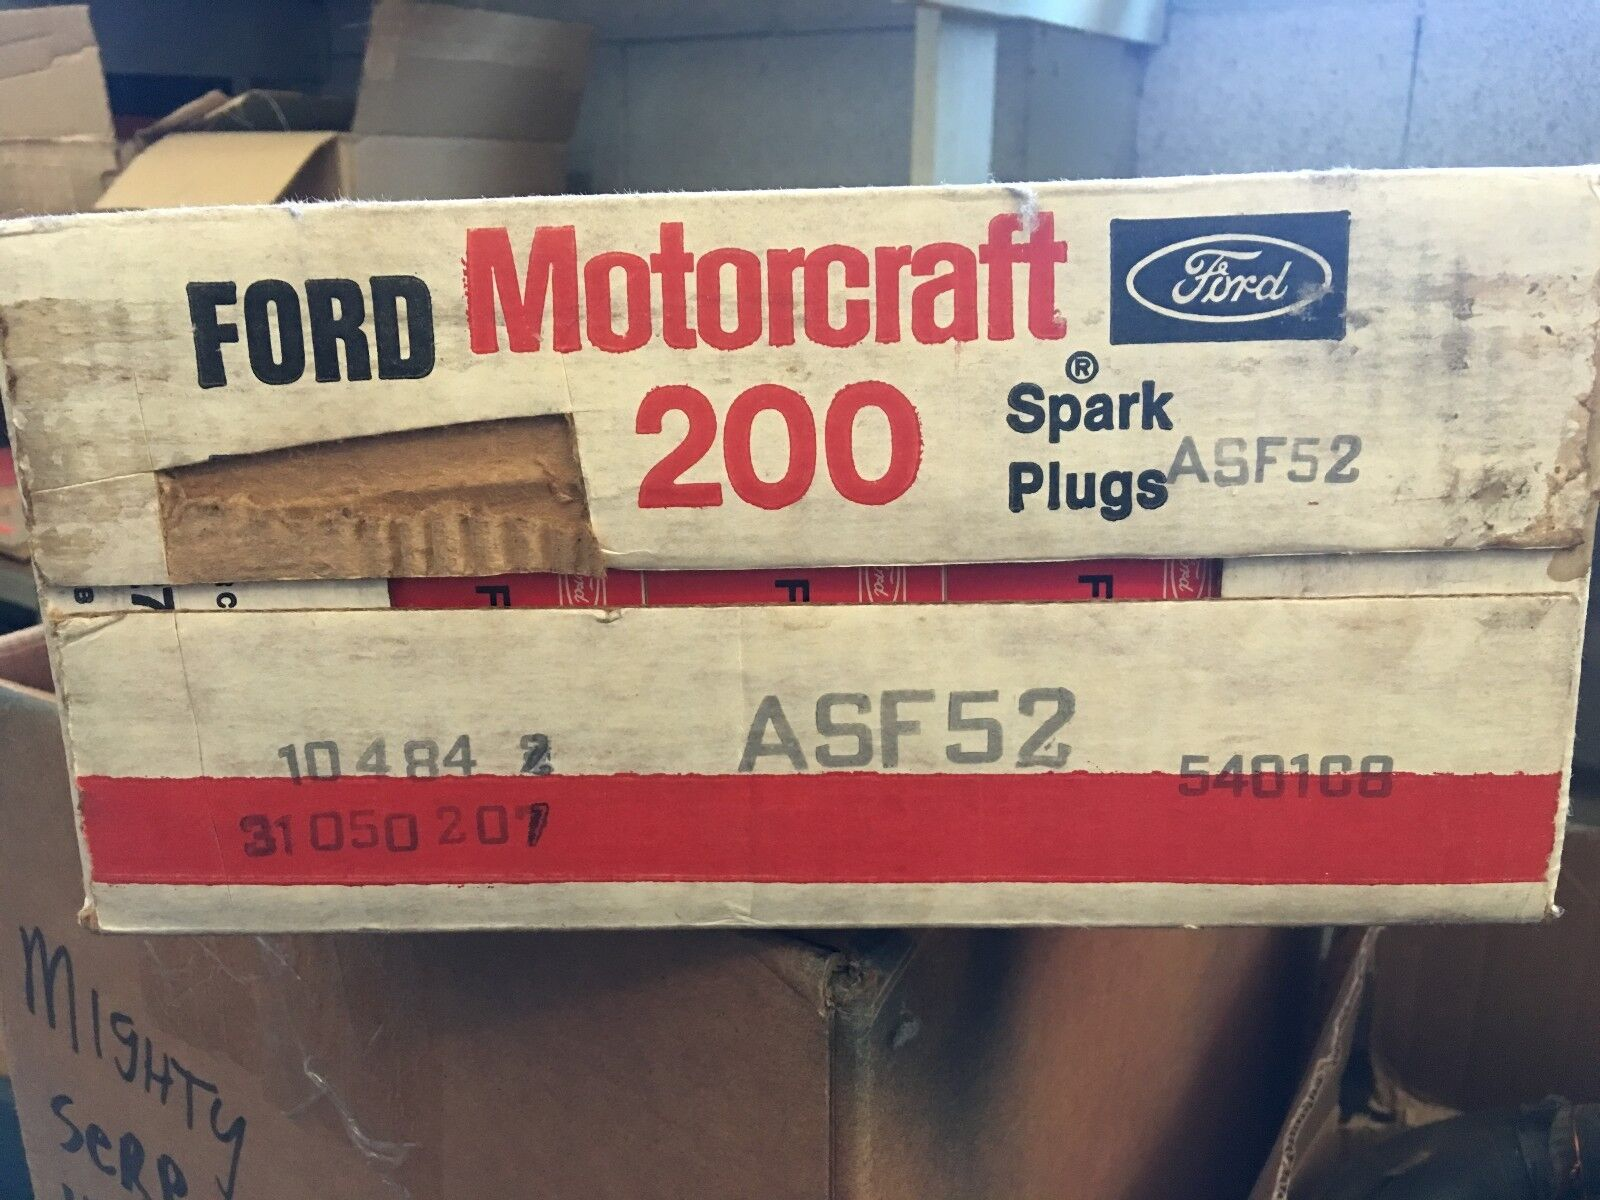 NOS Ford Motorcraft Spark Plug ASF52 Lot, 200 pcs